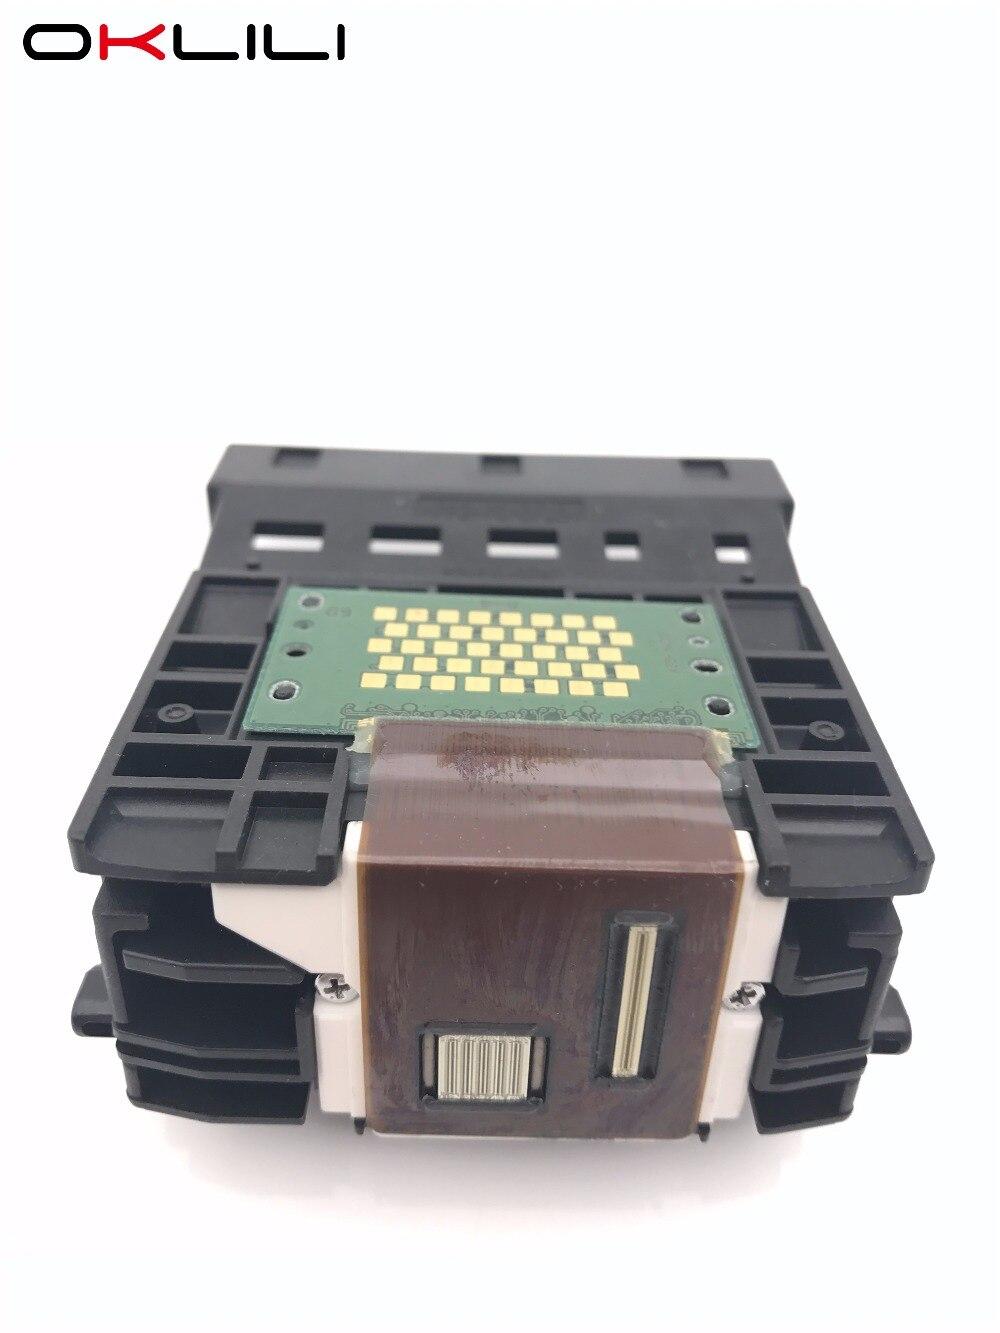 OKLILI ORIGINAL QY6-0045 QY6-0045-000 Printhead Print Head Printer Head for Canon i550 PIXUS 550i<br>